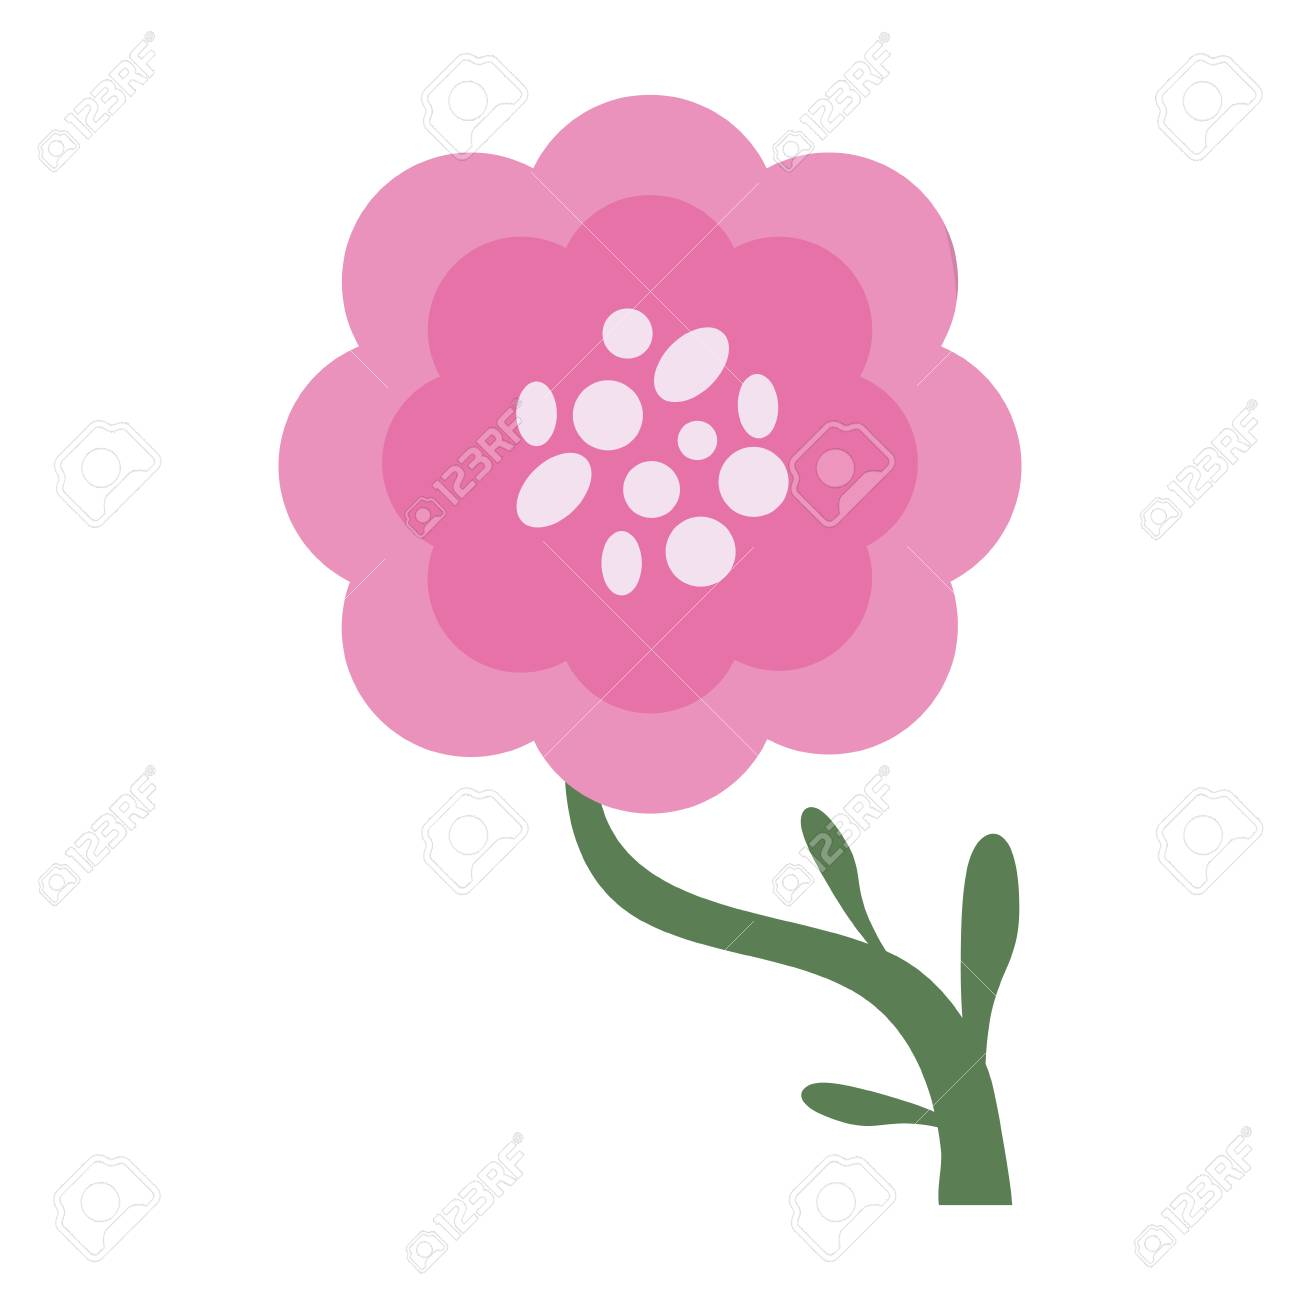 Single Pink Flower Icon Image Vector Illustration Design Royalty